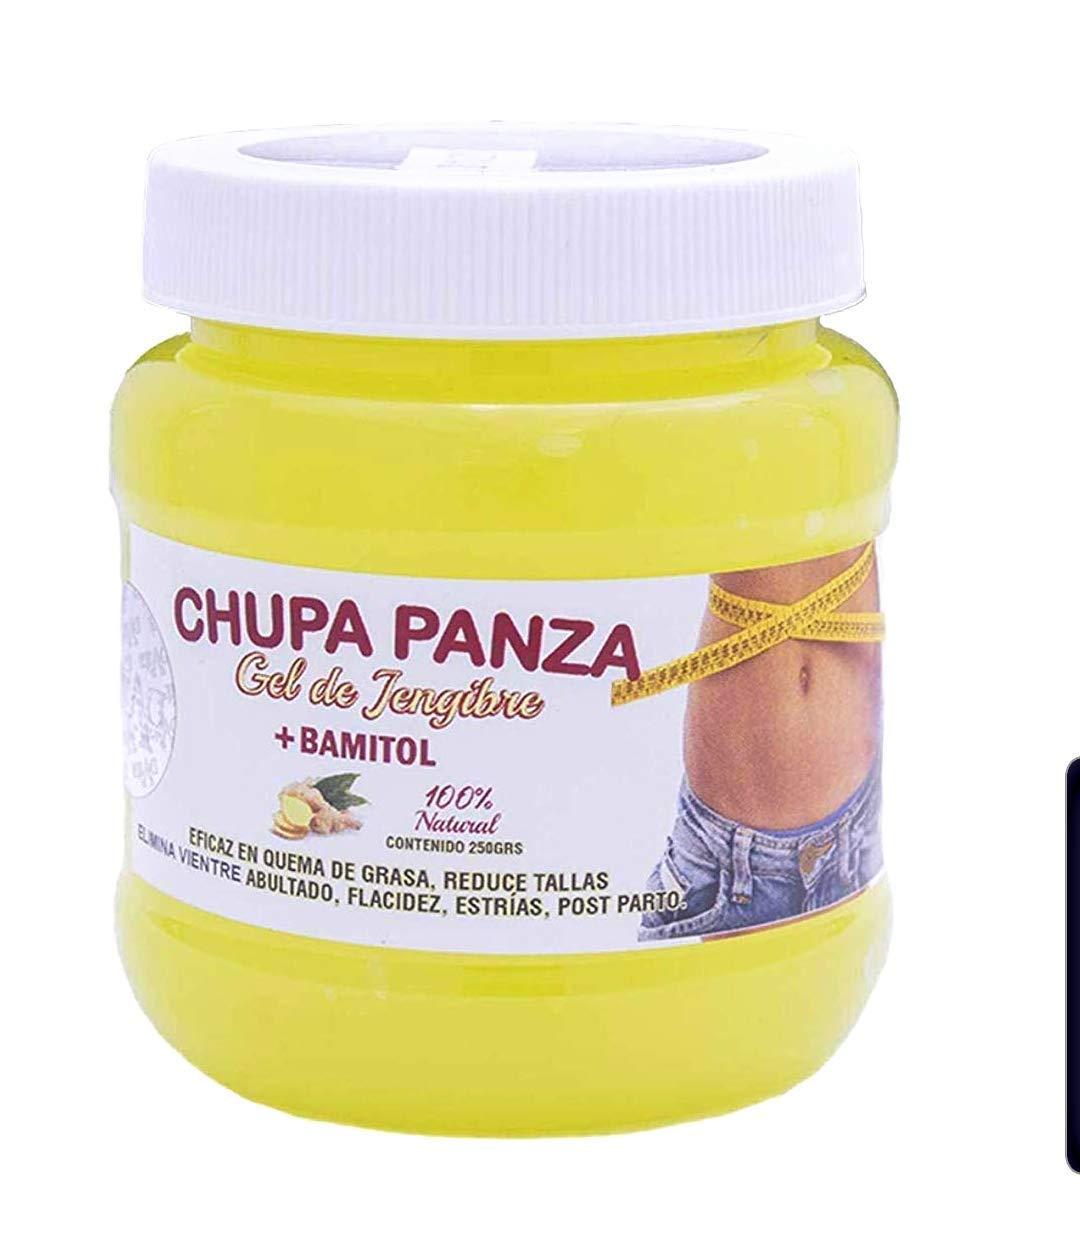 Chupa Panza Gel de jengire + bamitol 100% natural pieces of ginger